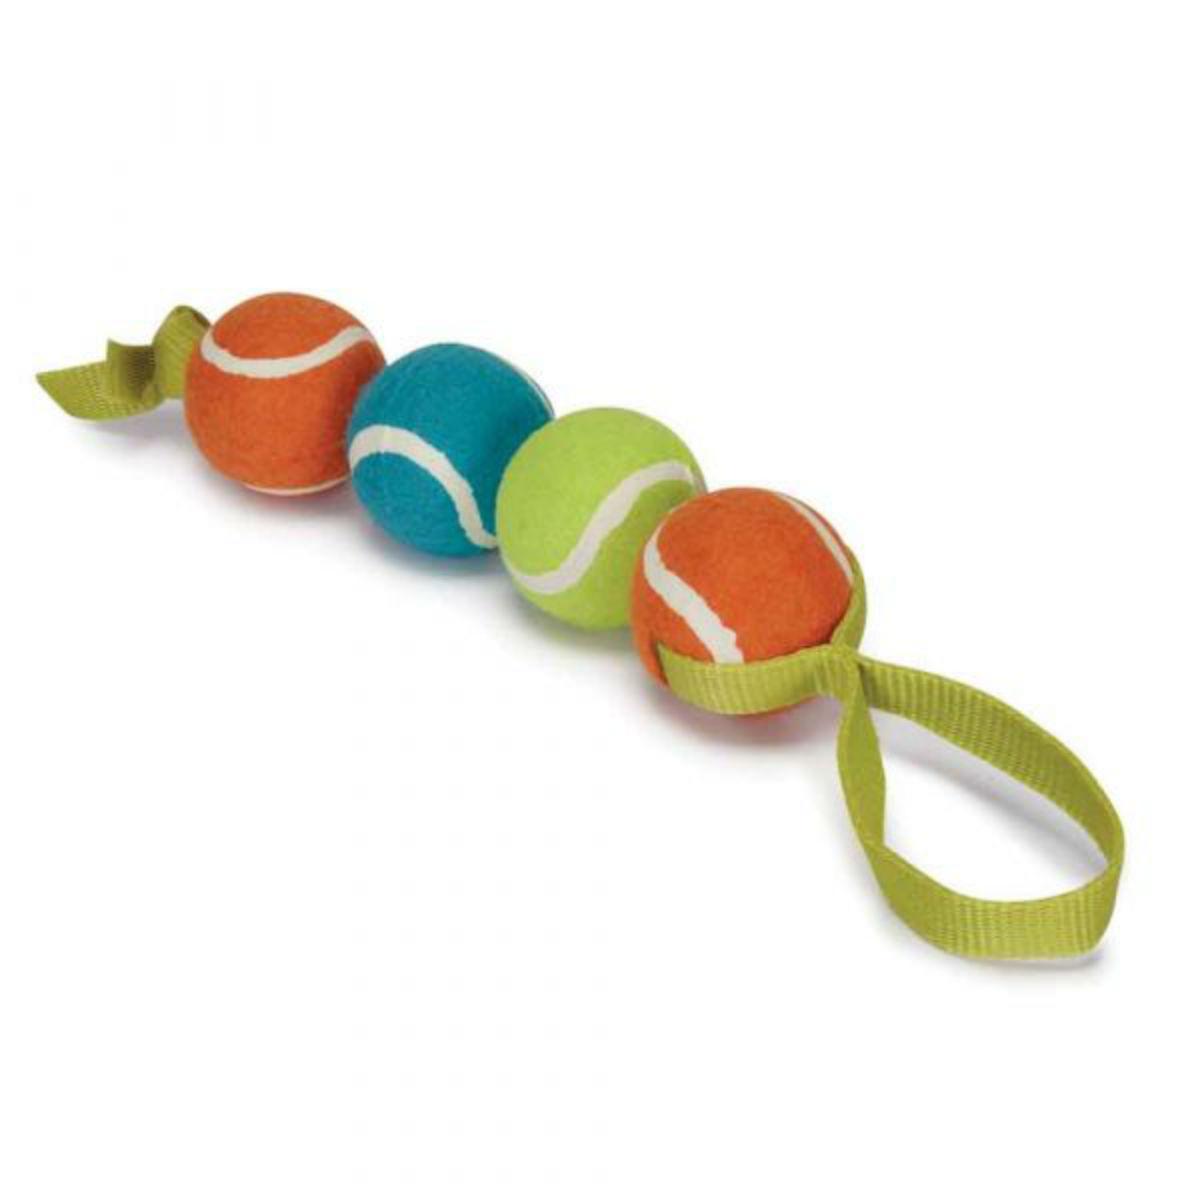 Chomper Four-Ball Nylon Tennis Tug Dog Toy